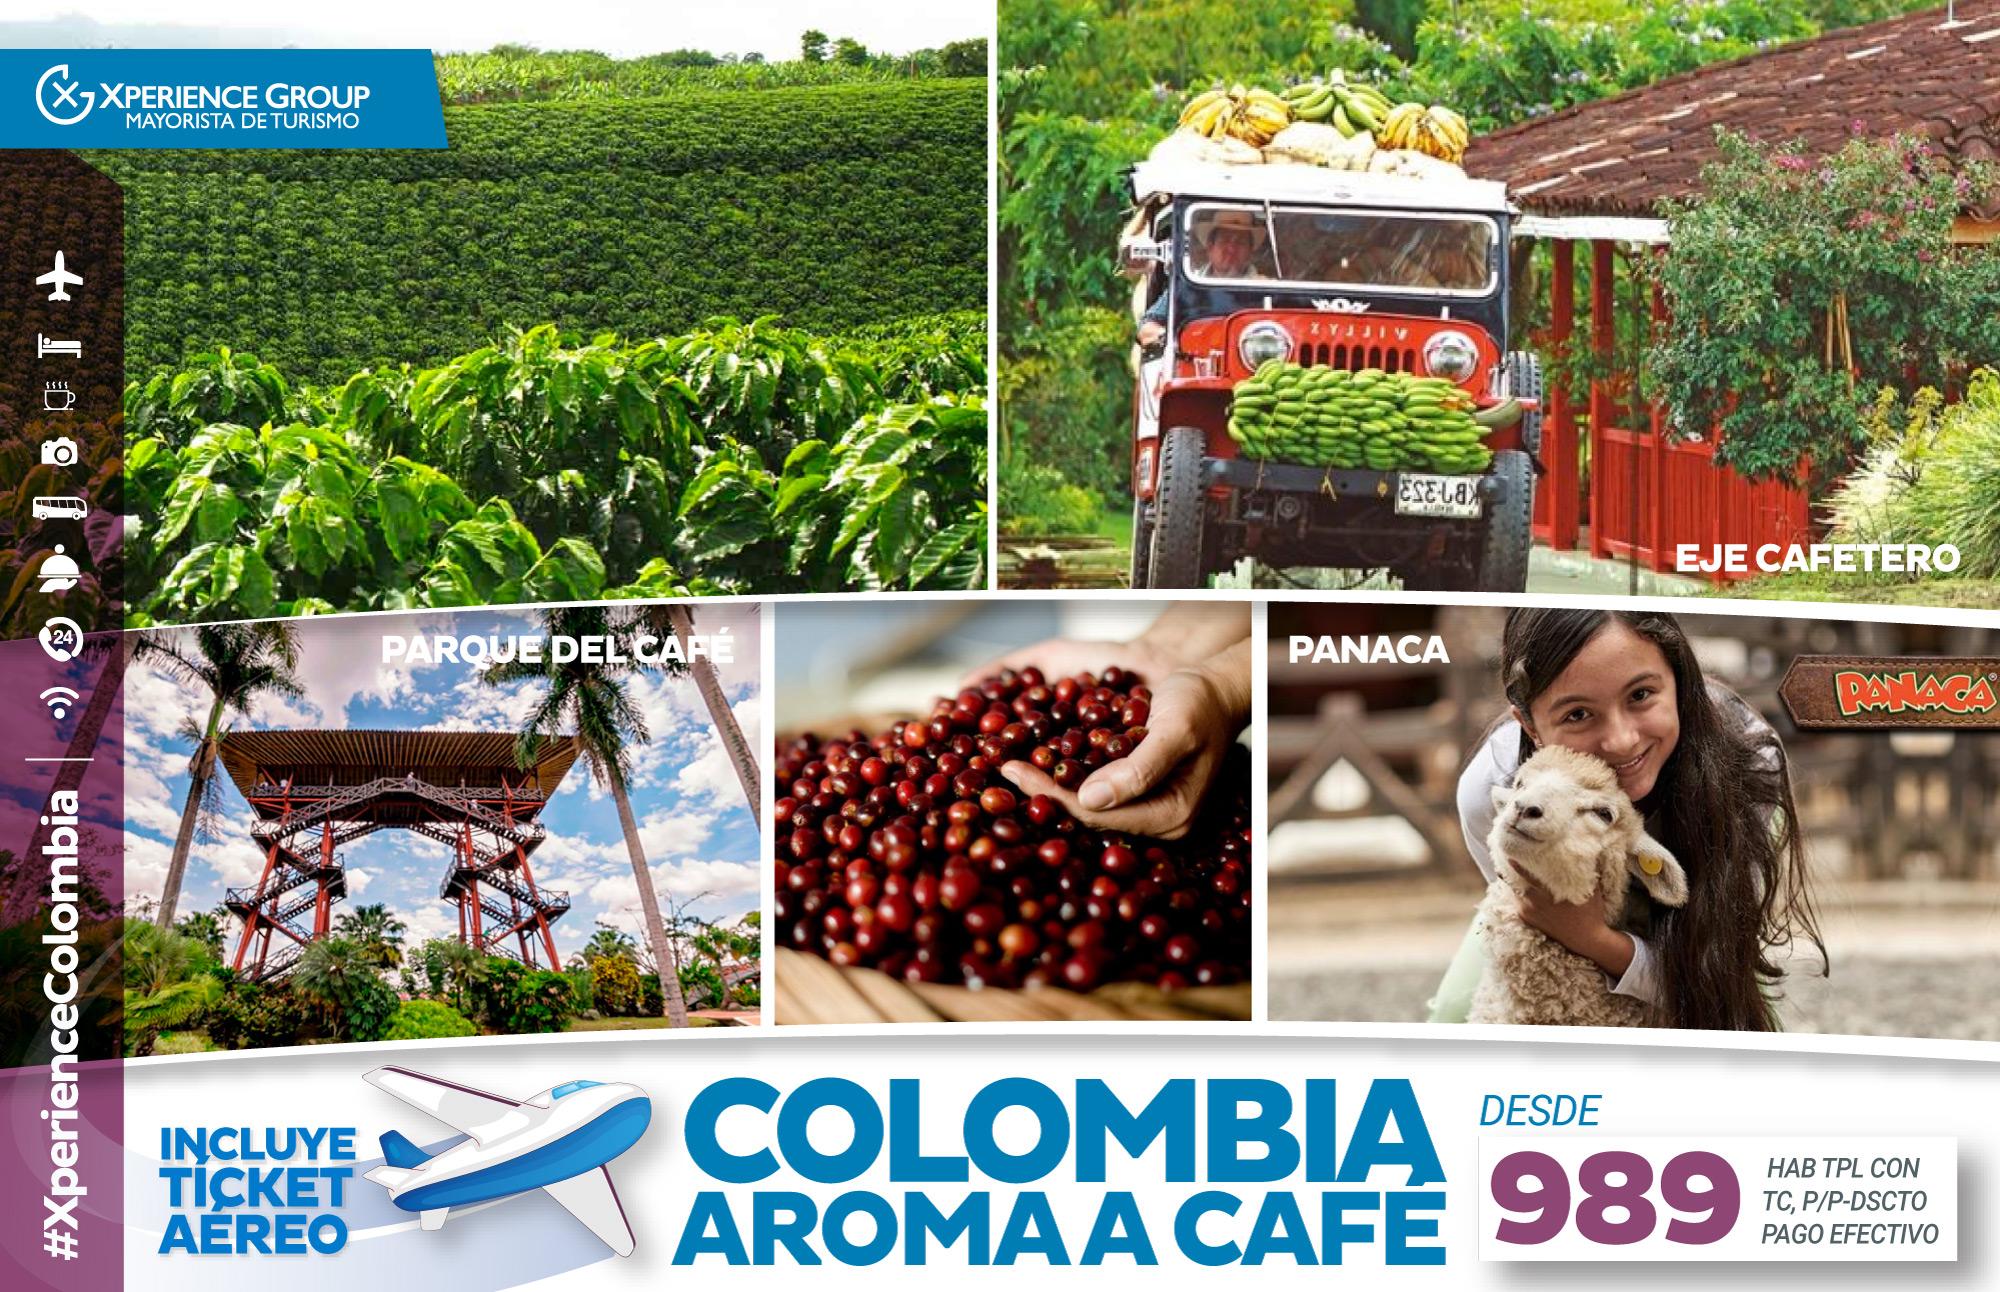 COLOMBIA, AROMA A CAFÉ